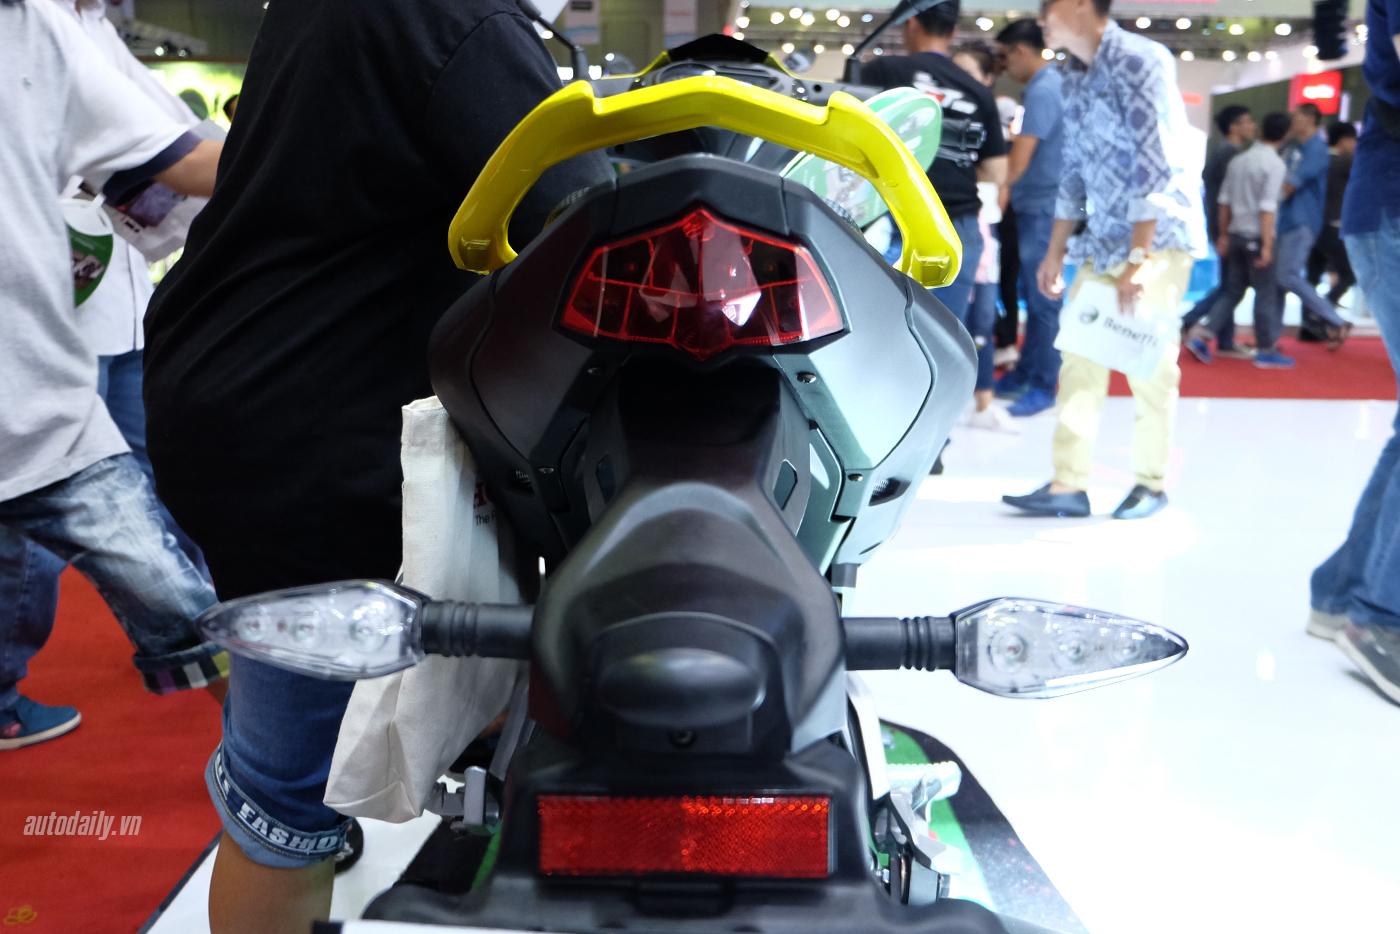 benelli-rsf-150i-32.JPG